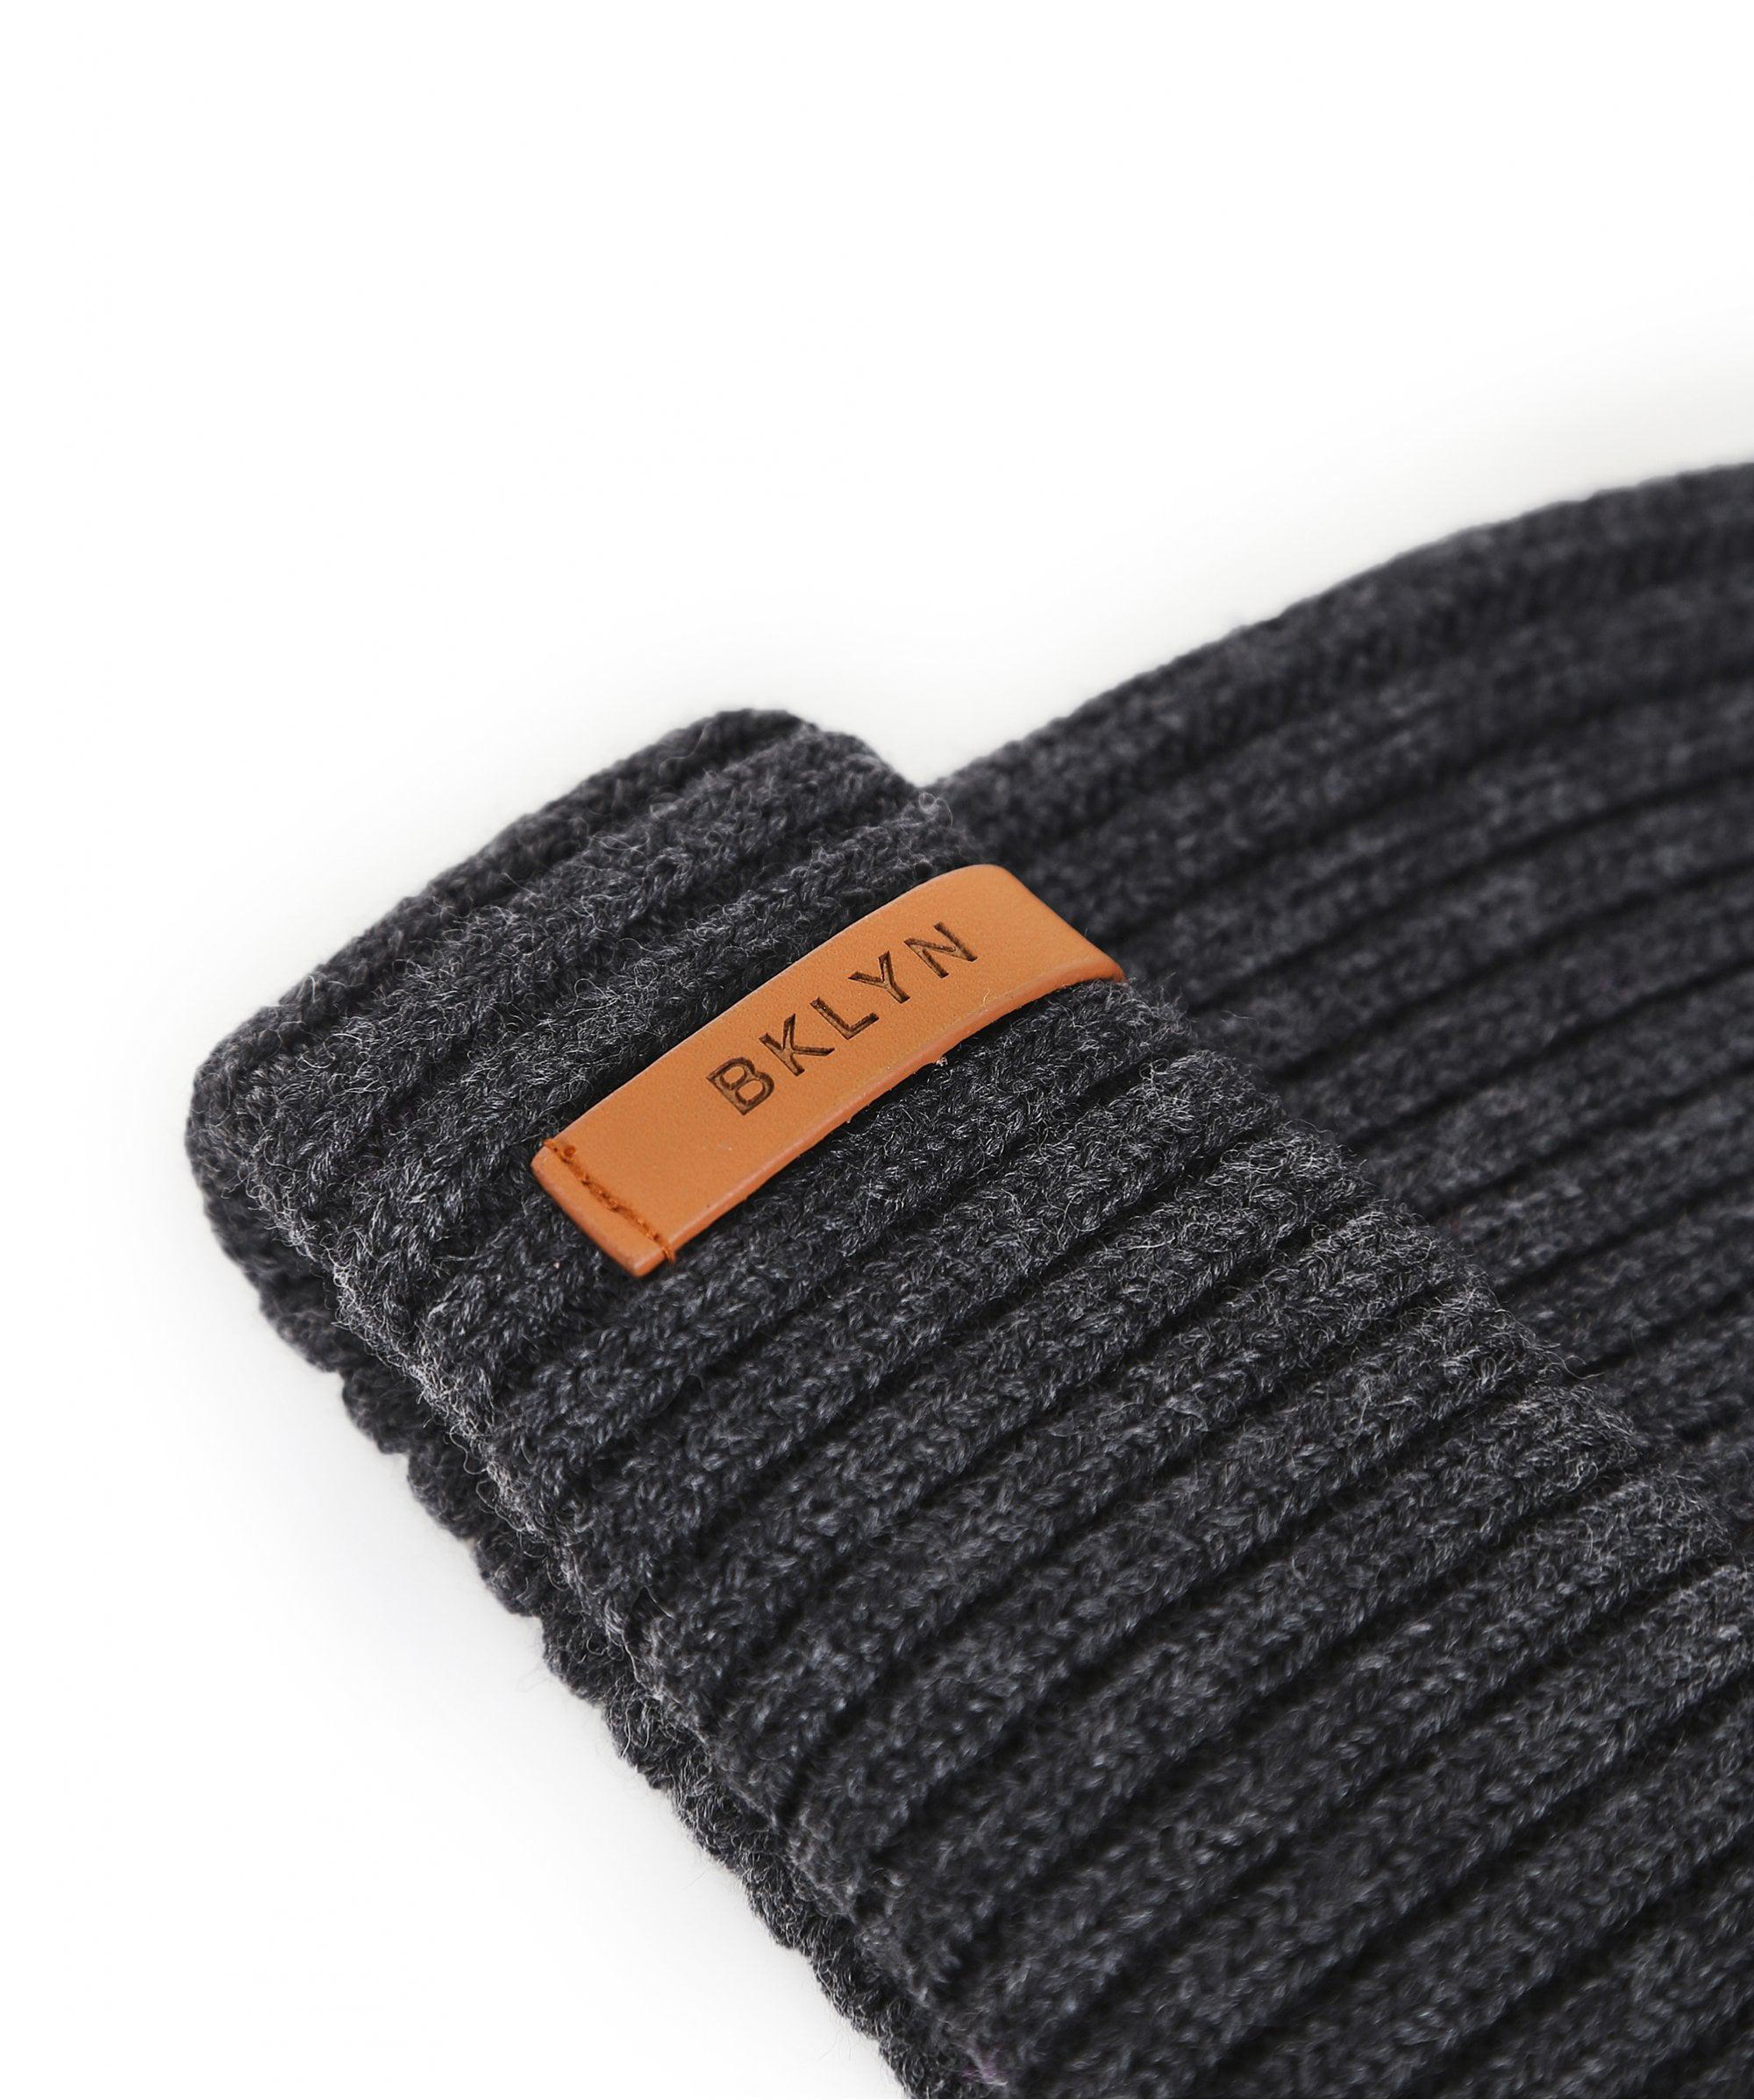 Lyst - Bklyn Merino Wool Beanie Hat in Gray 6bc3585bae72